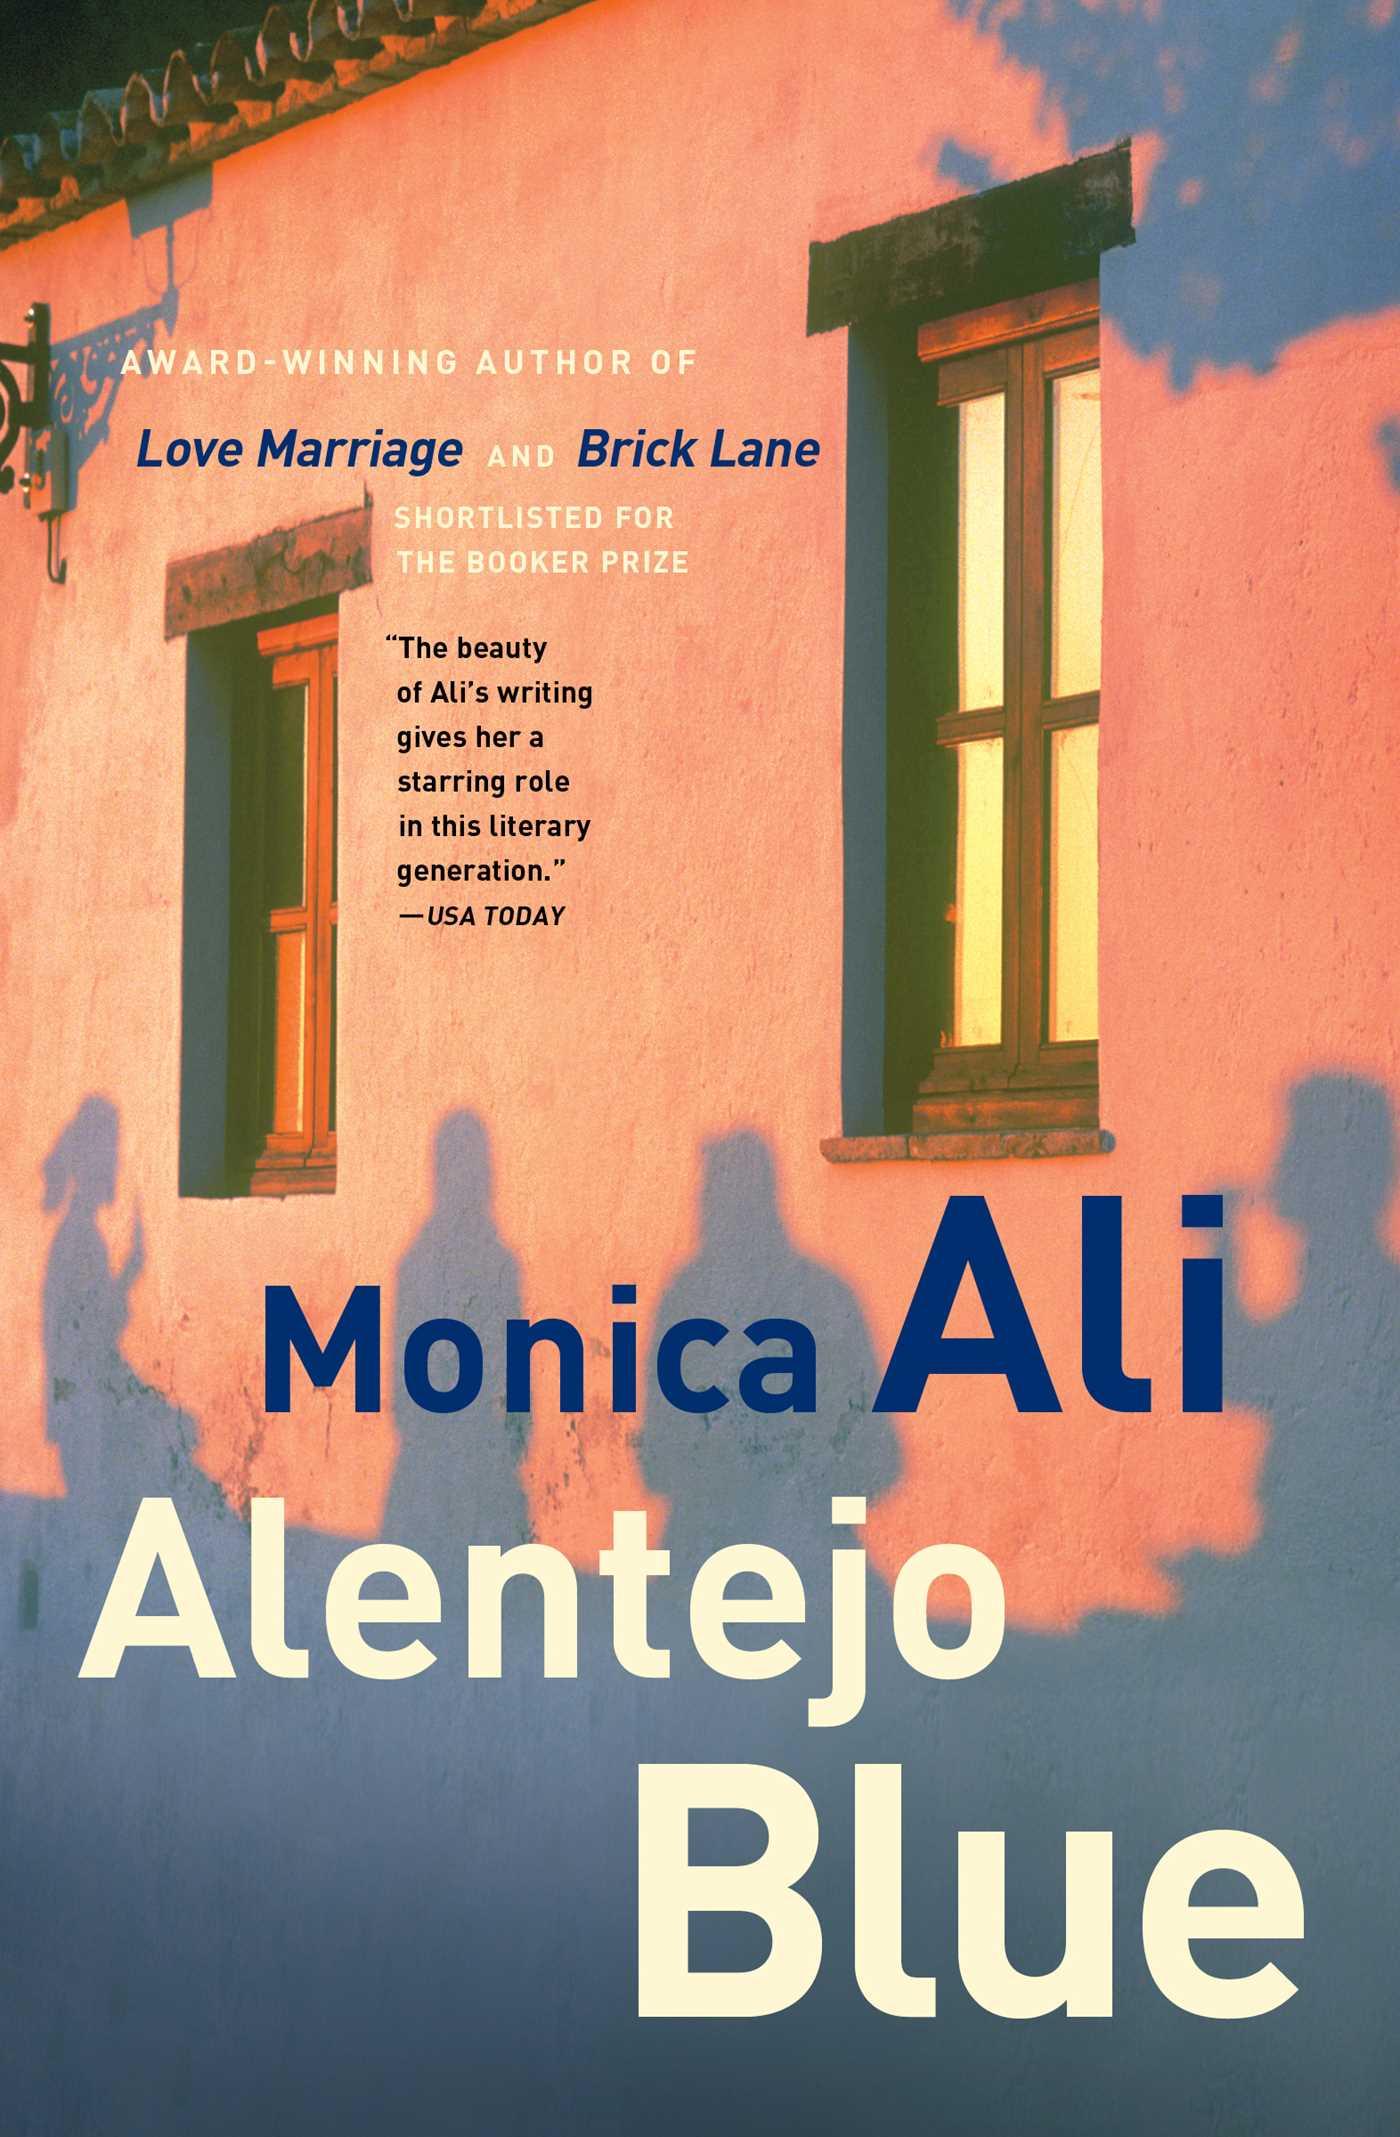 Alentejo blue 9780743293044 hr